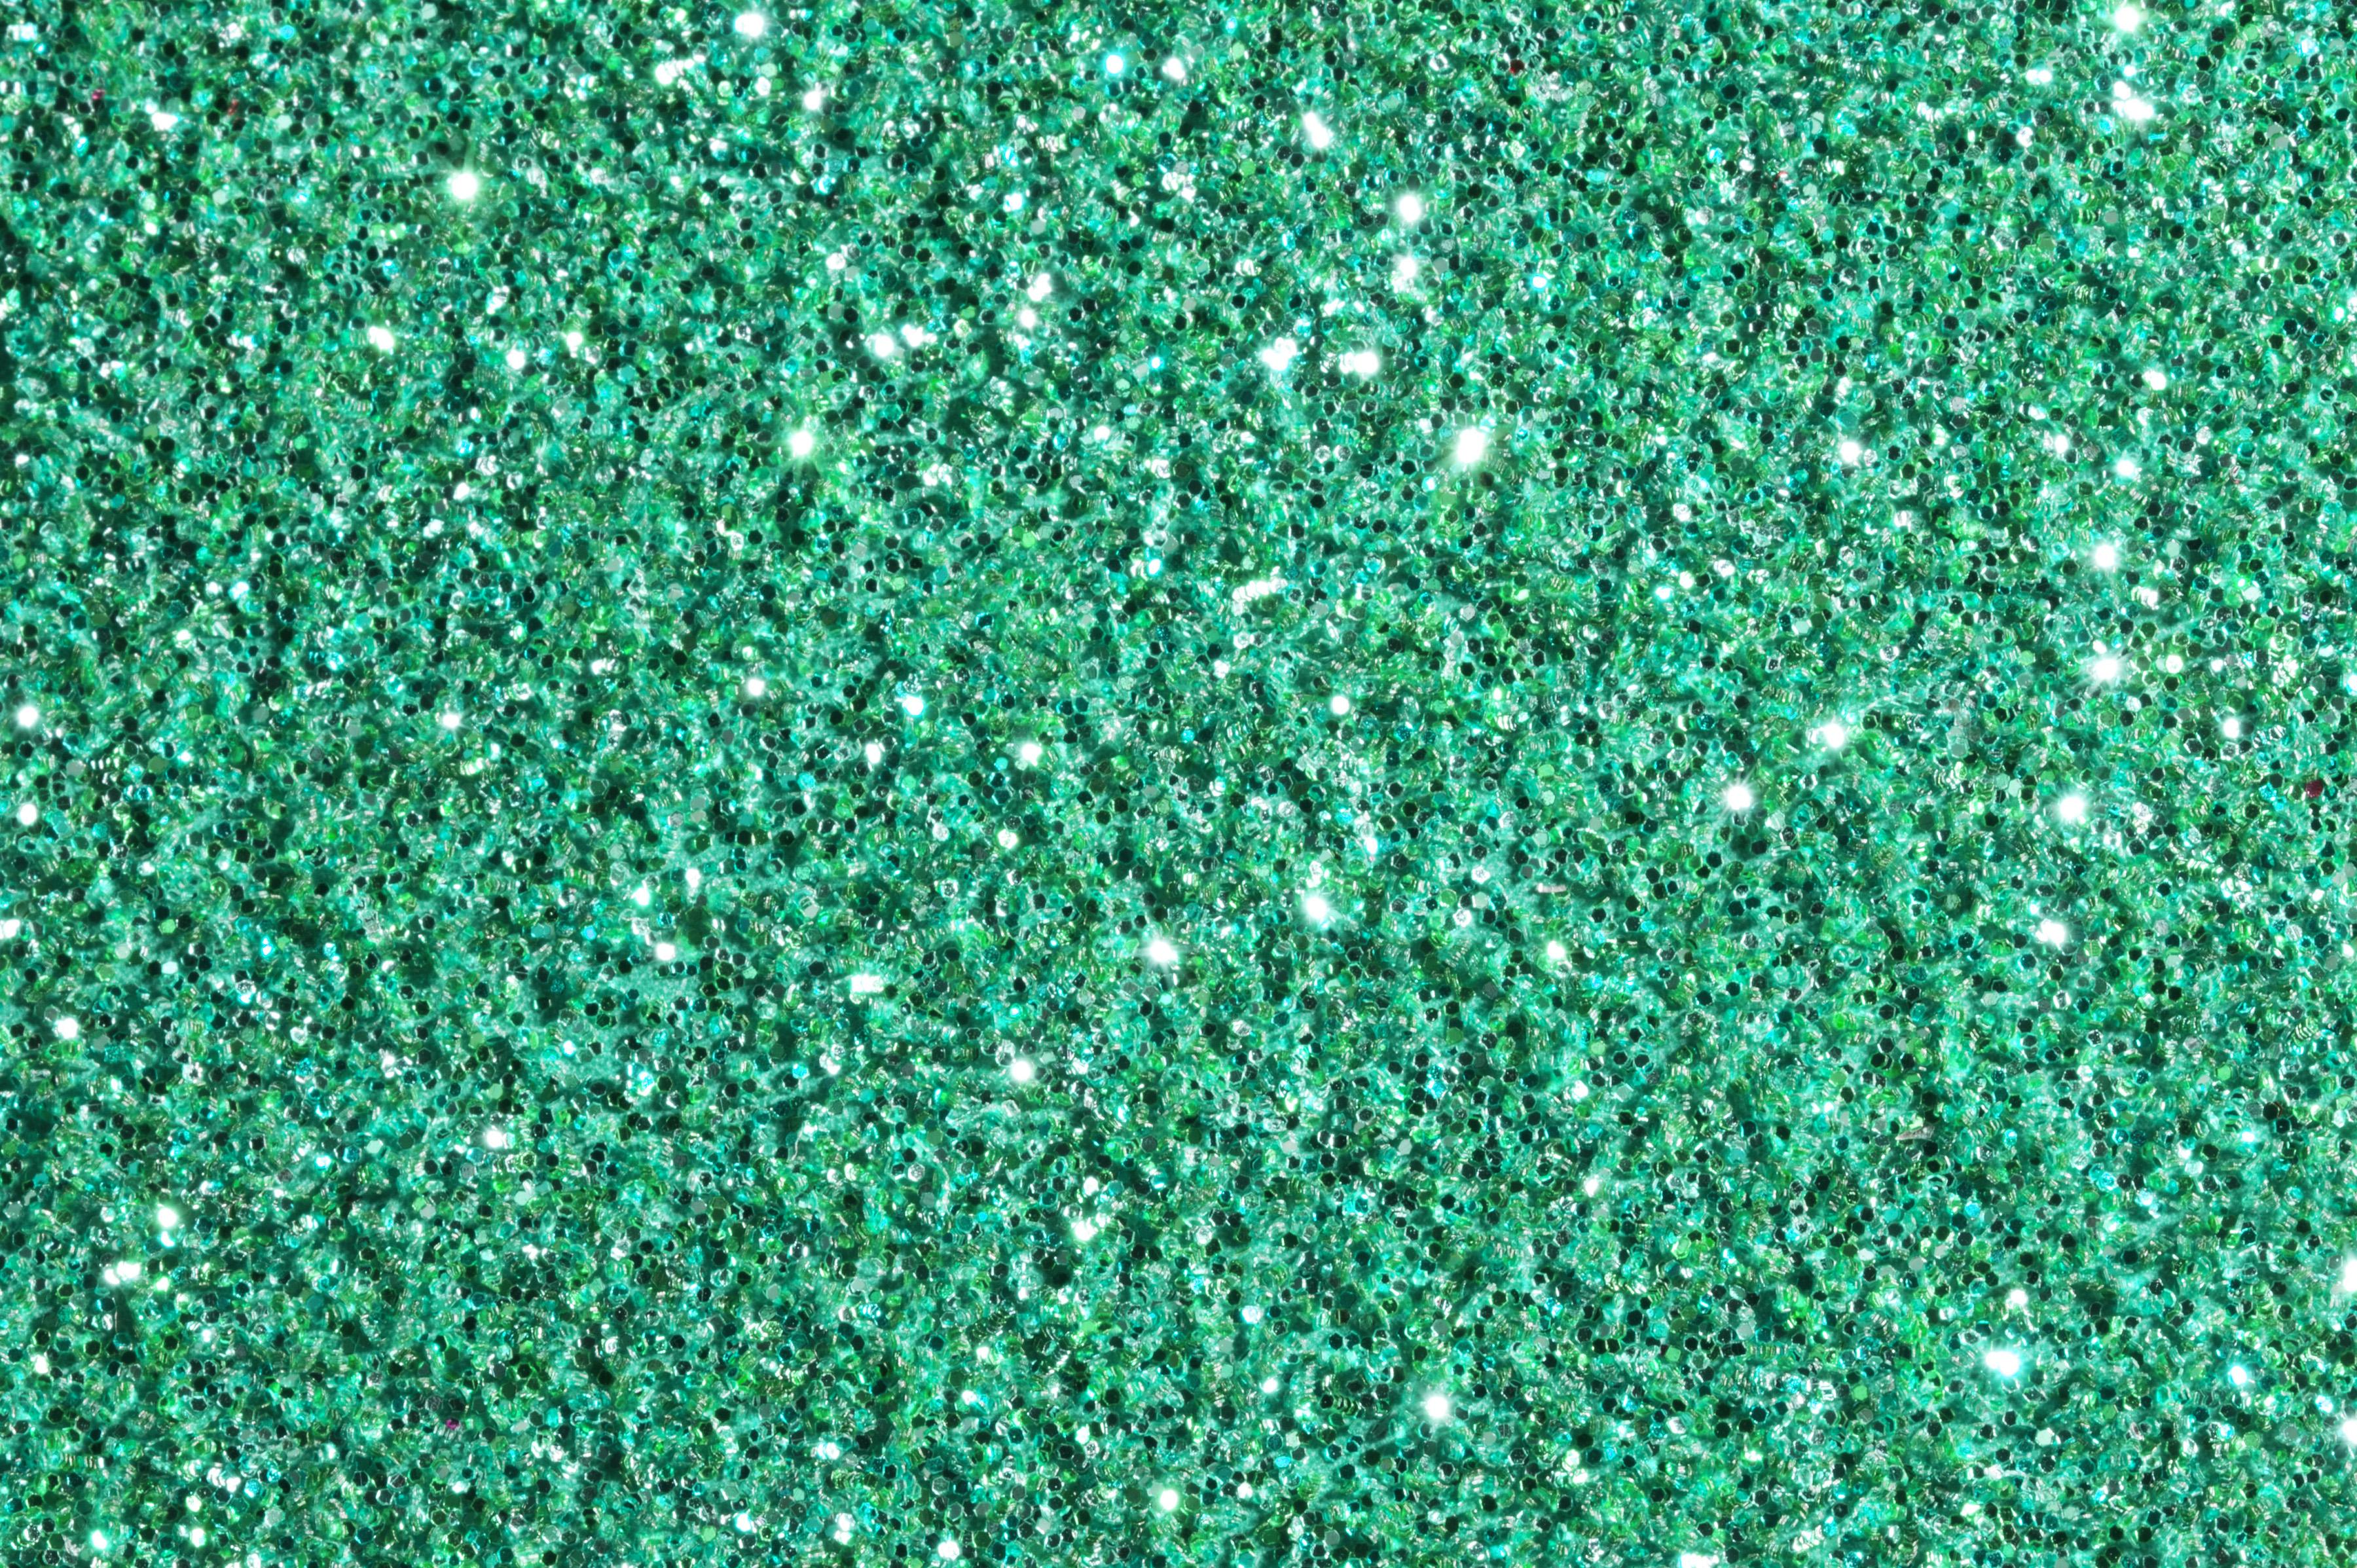 sparkling emerald green glitter